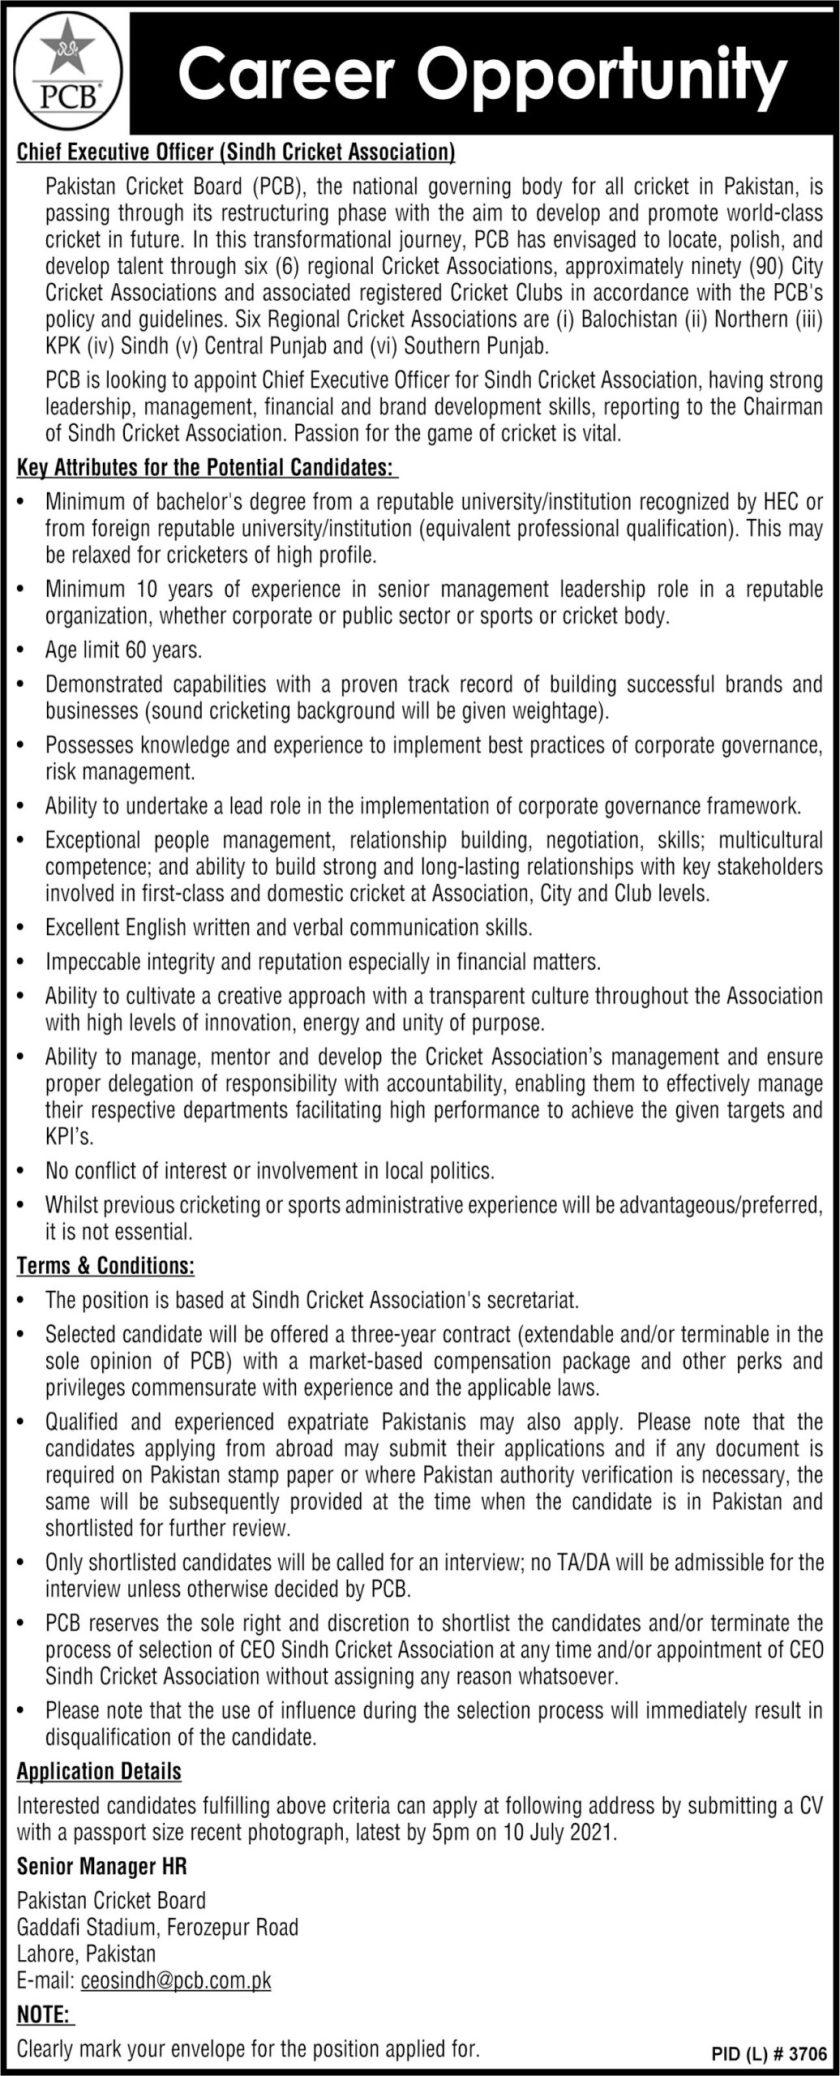 PCB Jobs 2021 Pakistan Cricket Board Lahore